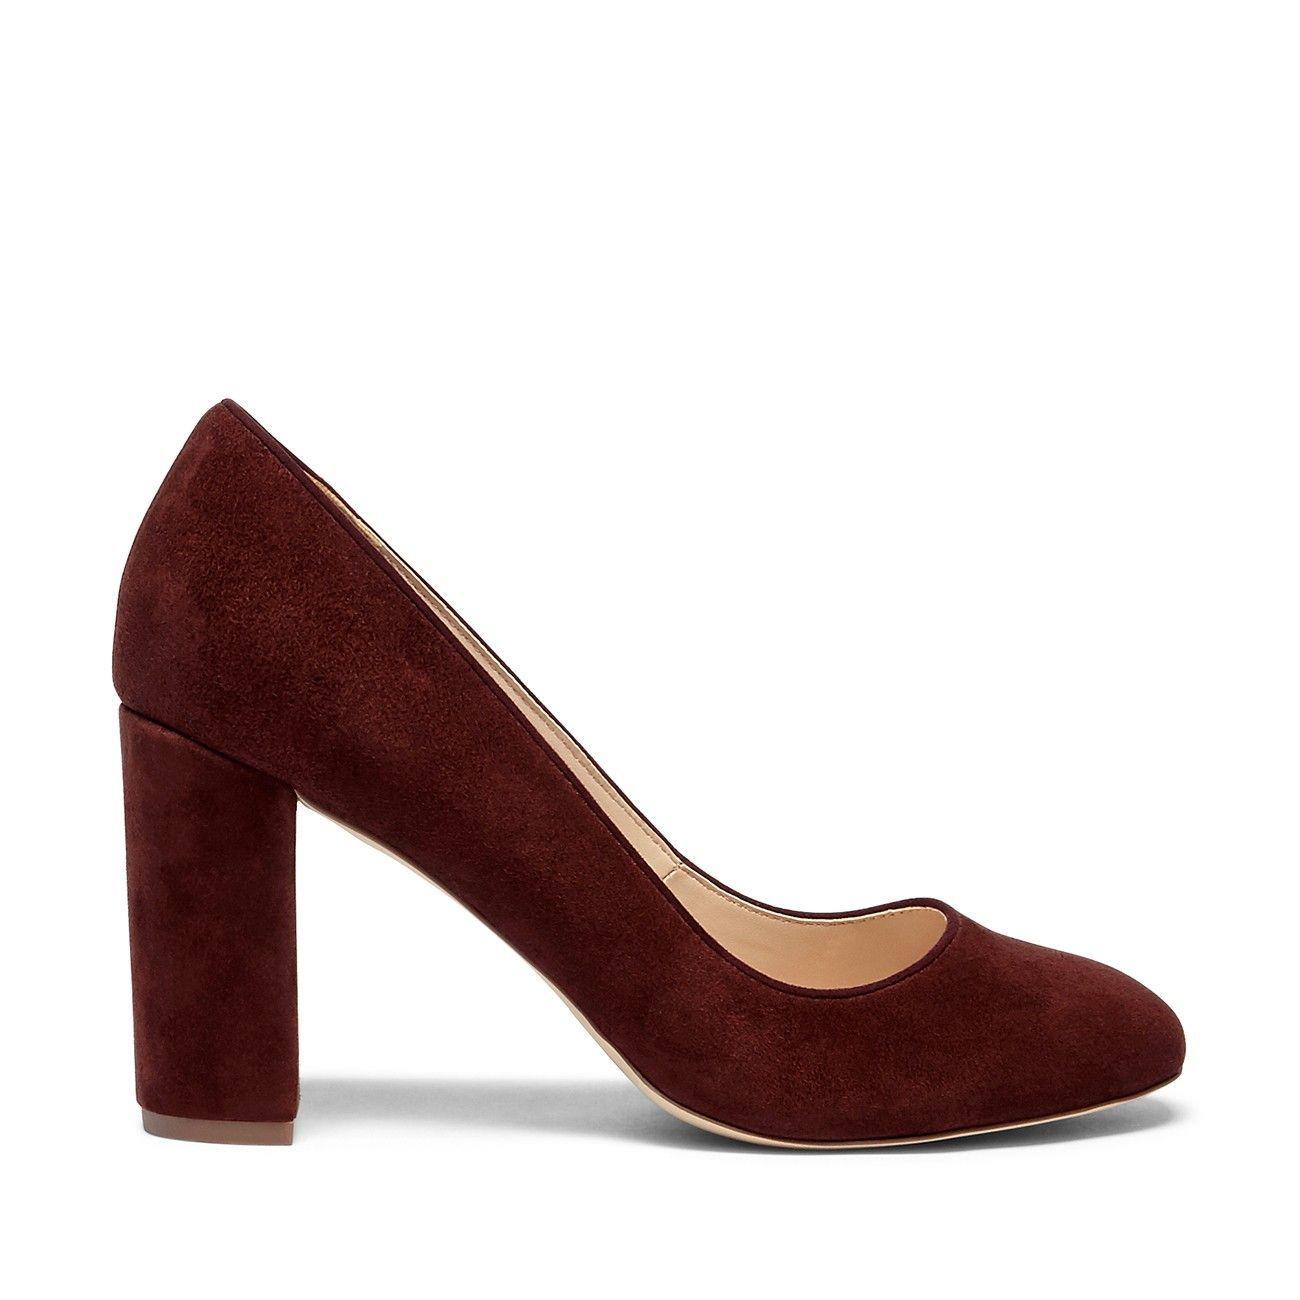 bfc1b23ae4c Giselle Block Heel Pump - Red Wine